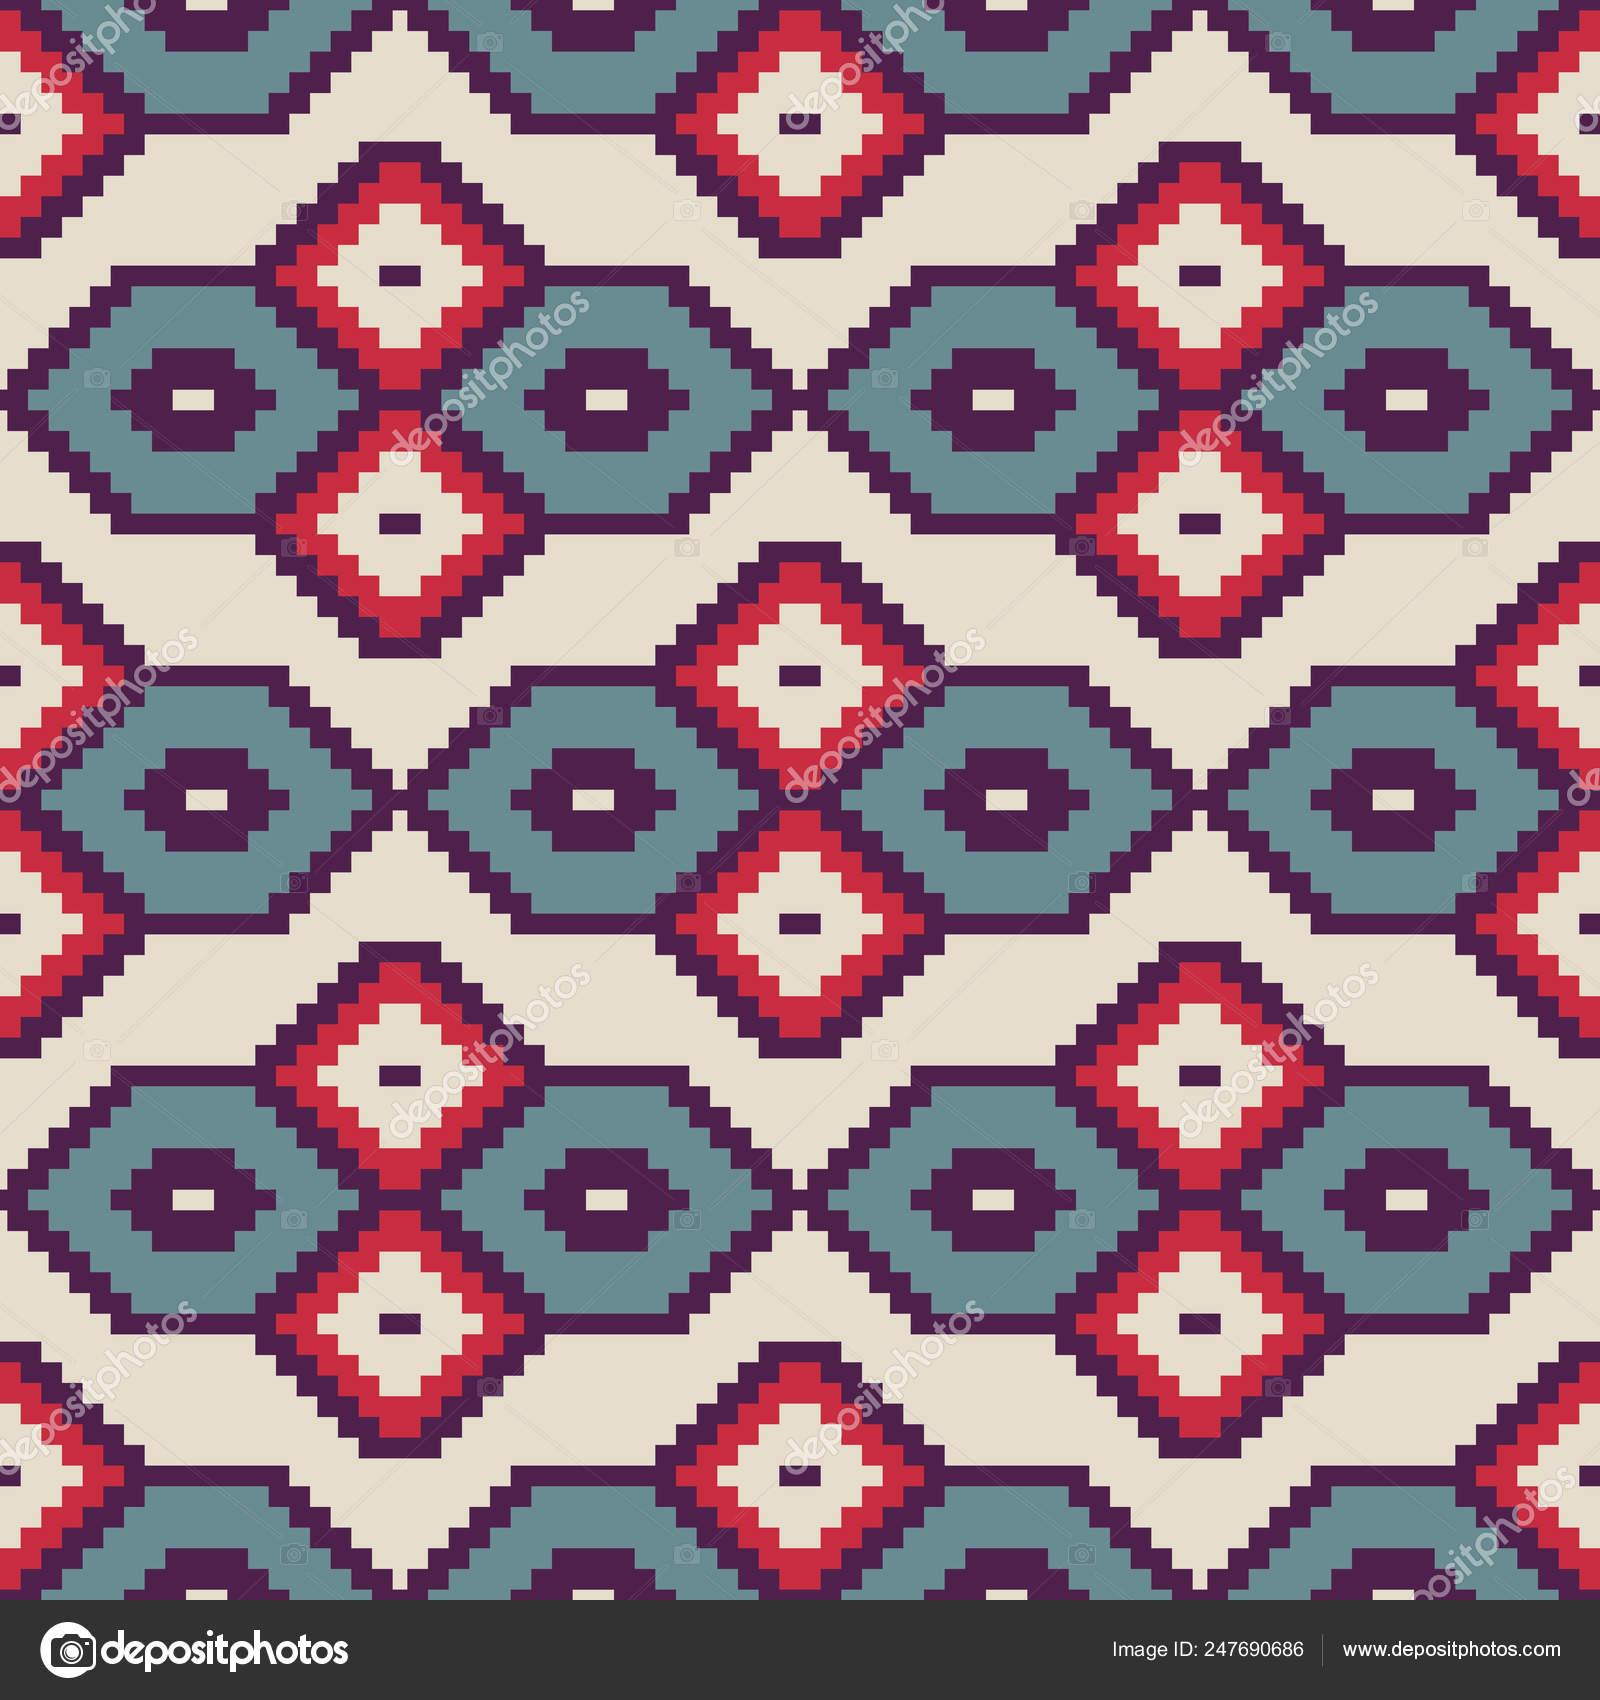 Seamless Decorative Ethnic Pattern Pixel Art Style Bit Designs